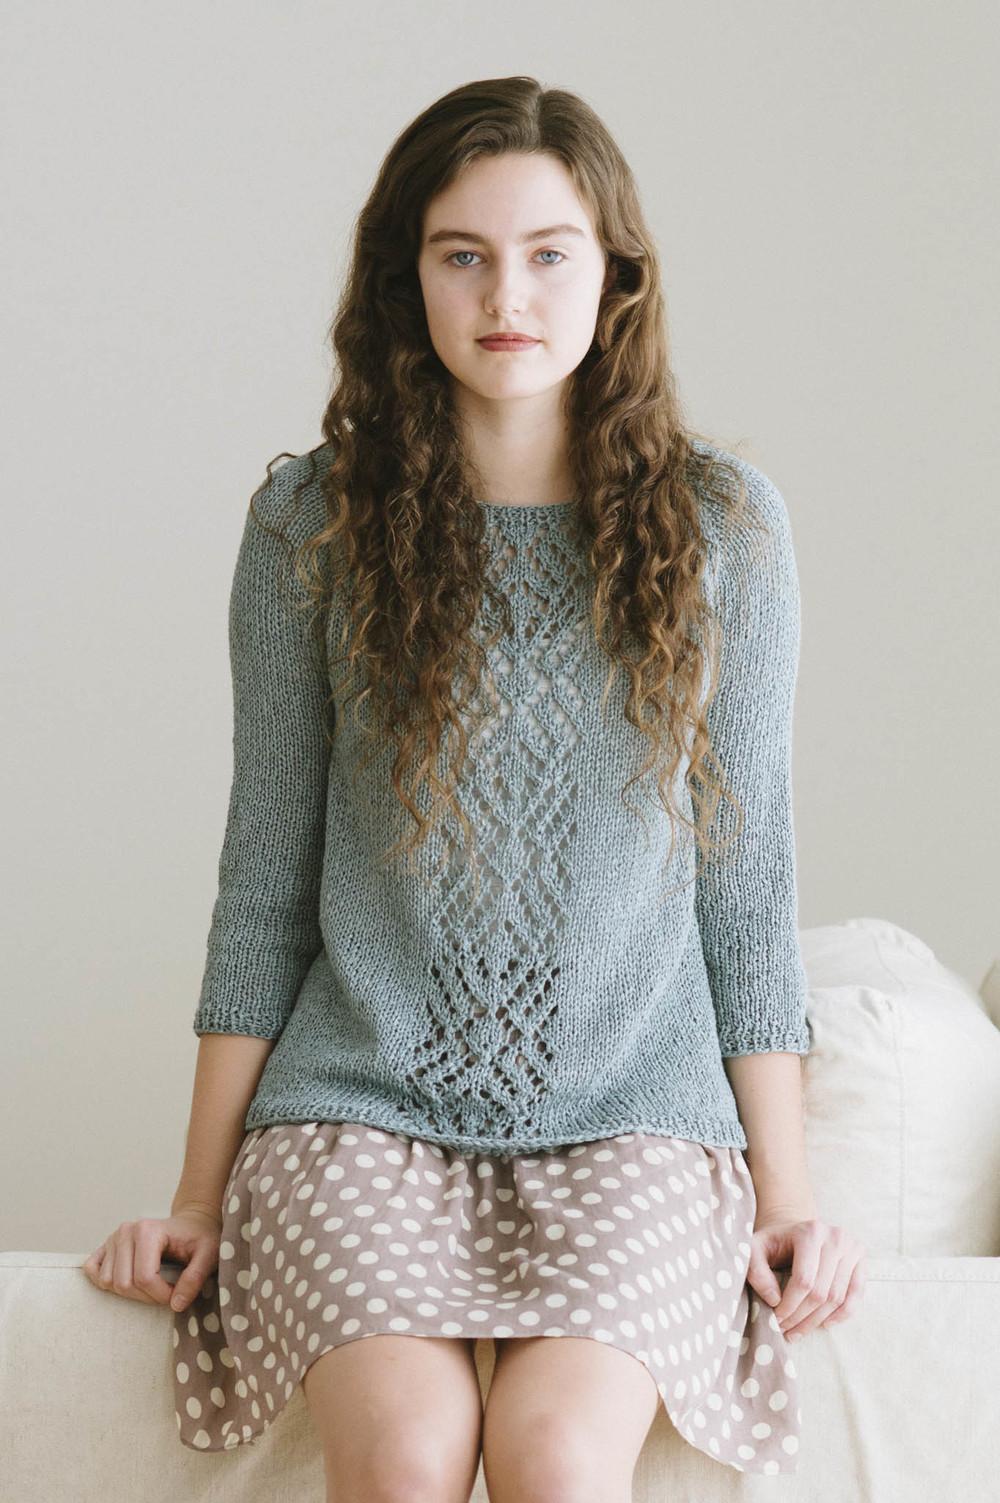 quince-co-adelaide-cecily-glowik-macdonald-knitting-pattern-kestrel-2.jpg